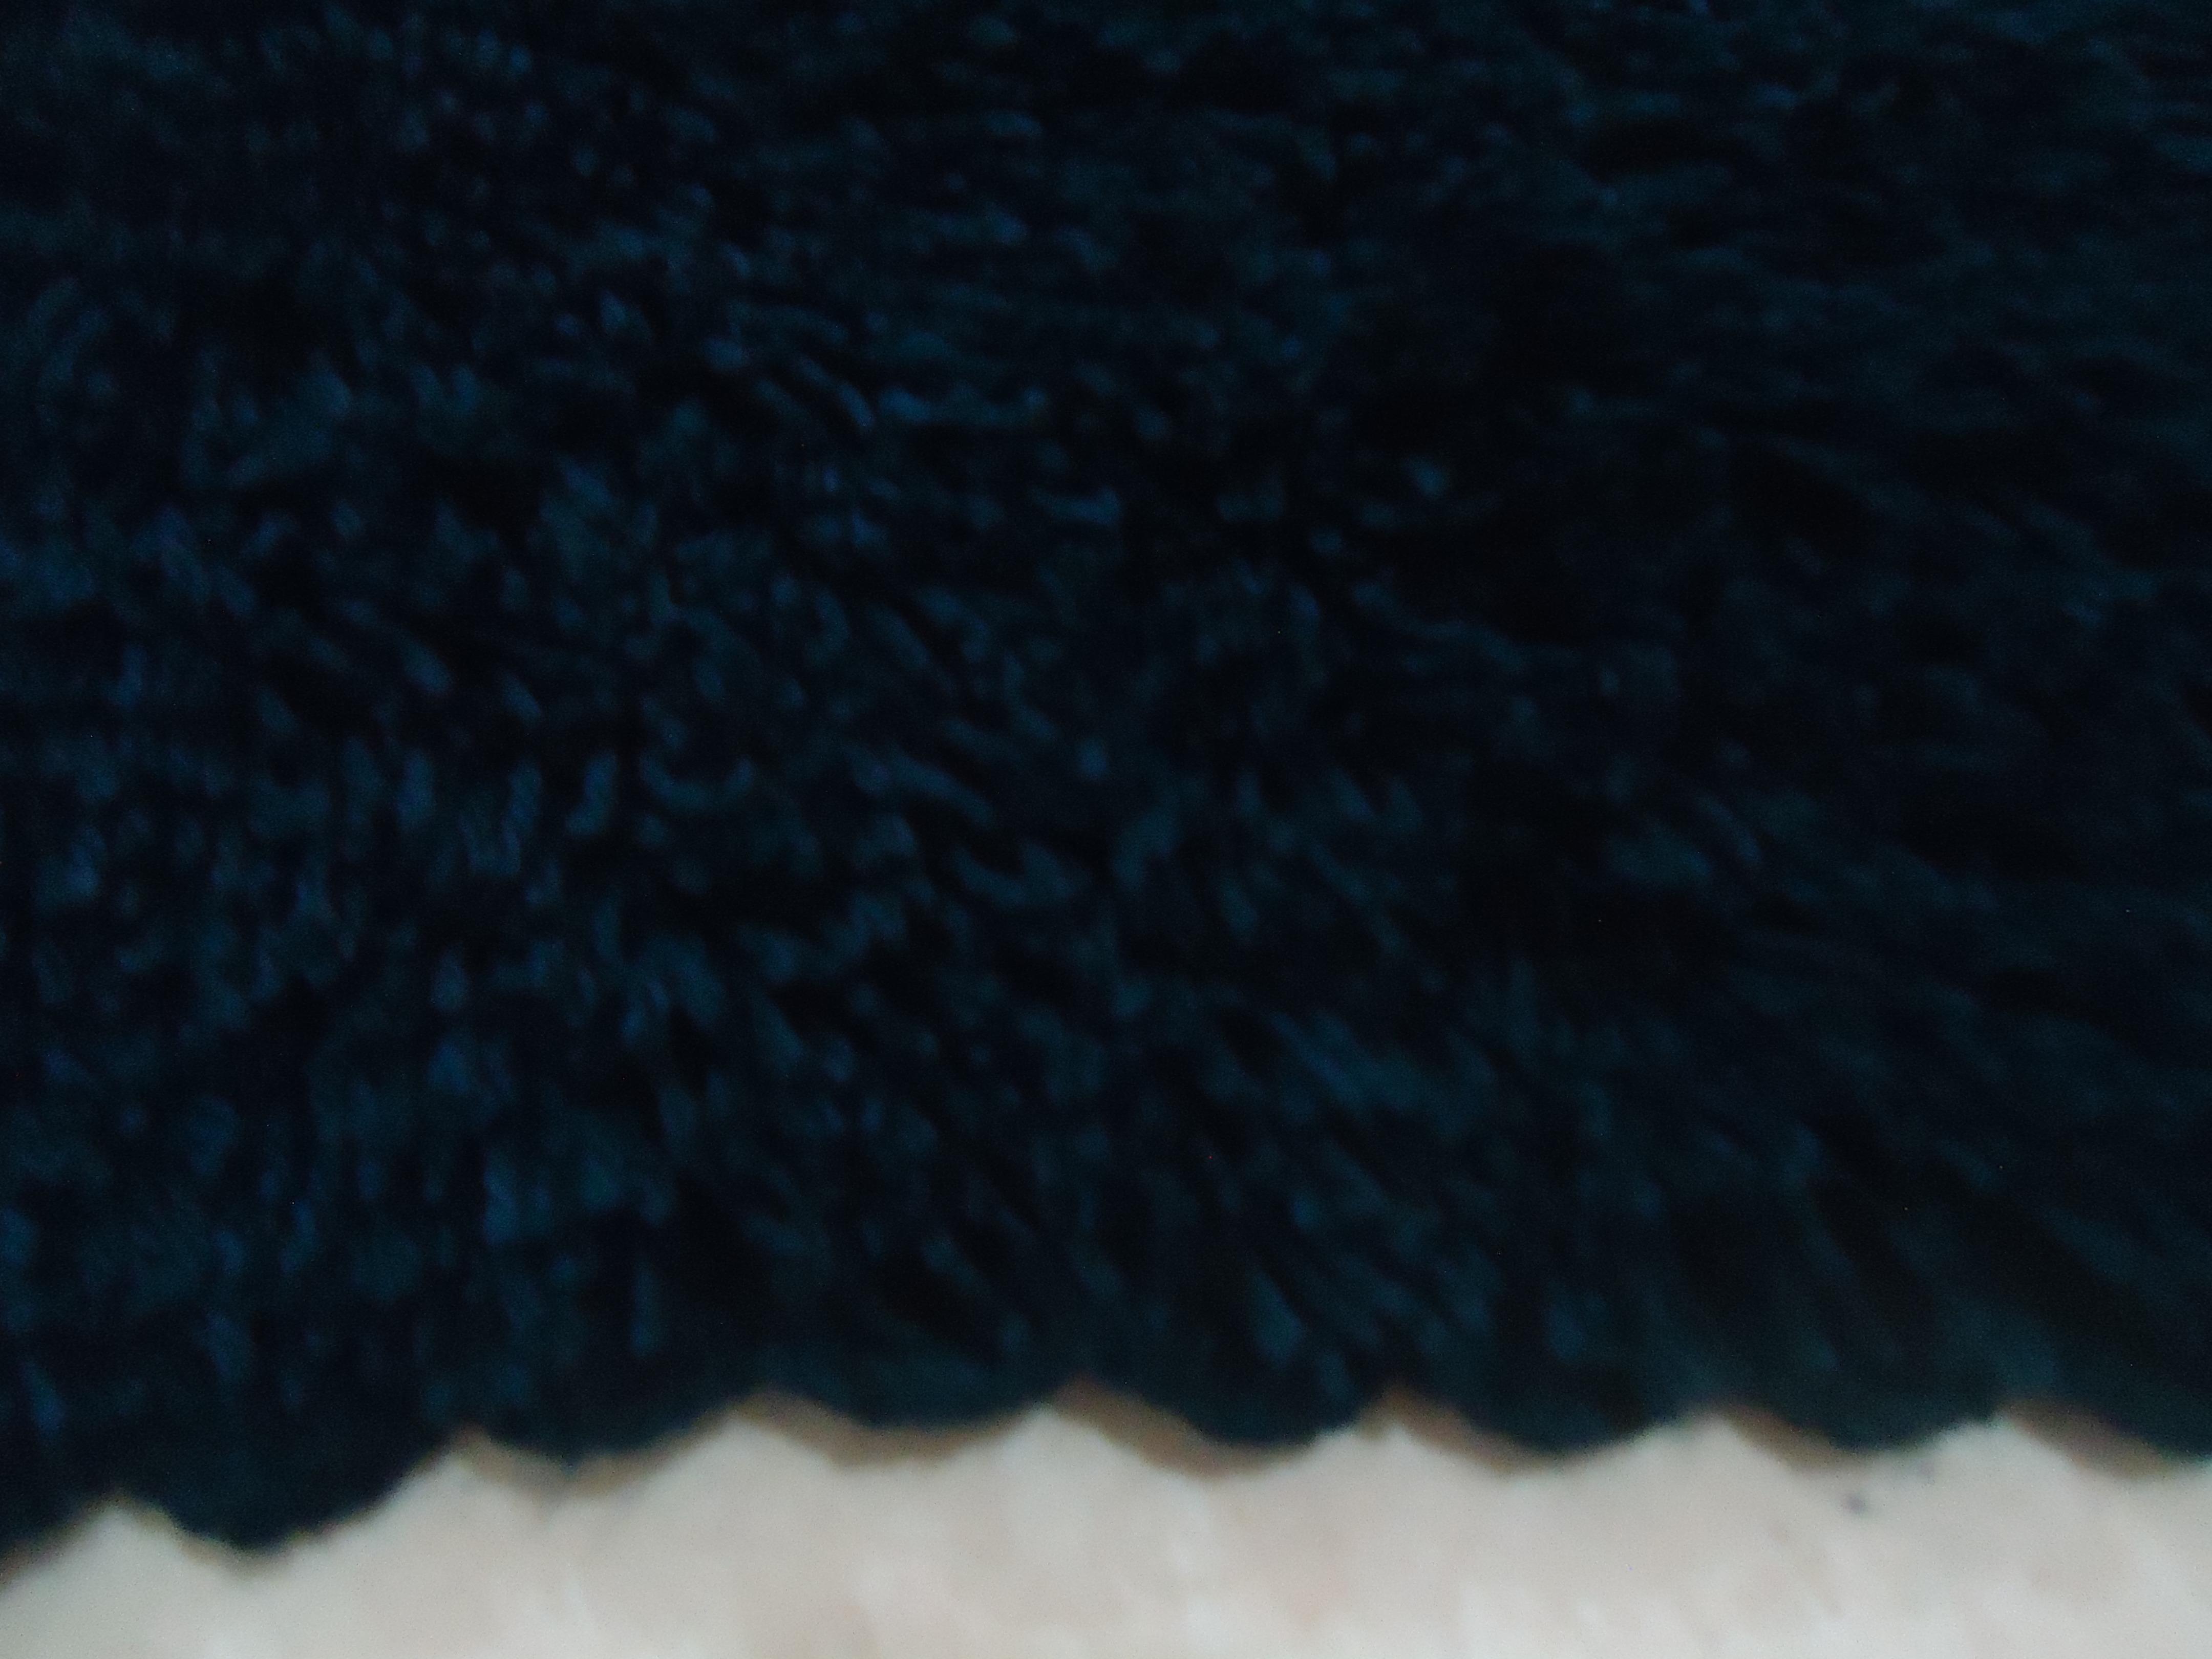 tapete azul marinho peludinho tapete azul marinho peludinho #071018 4320 3240